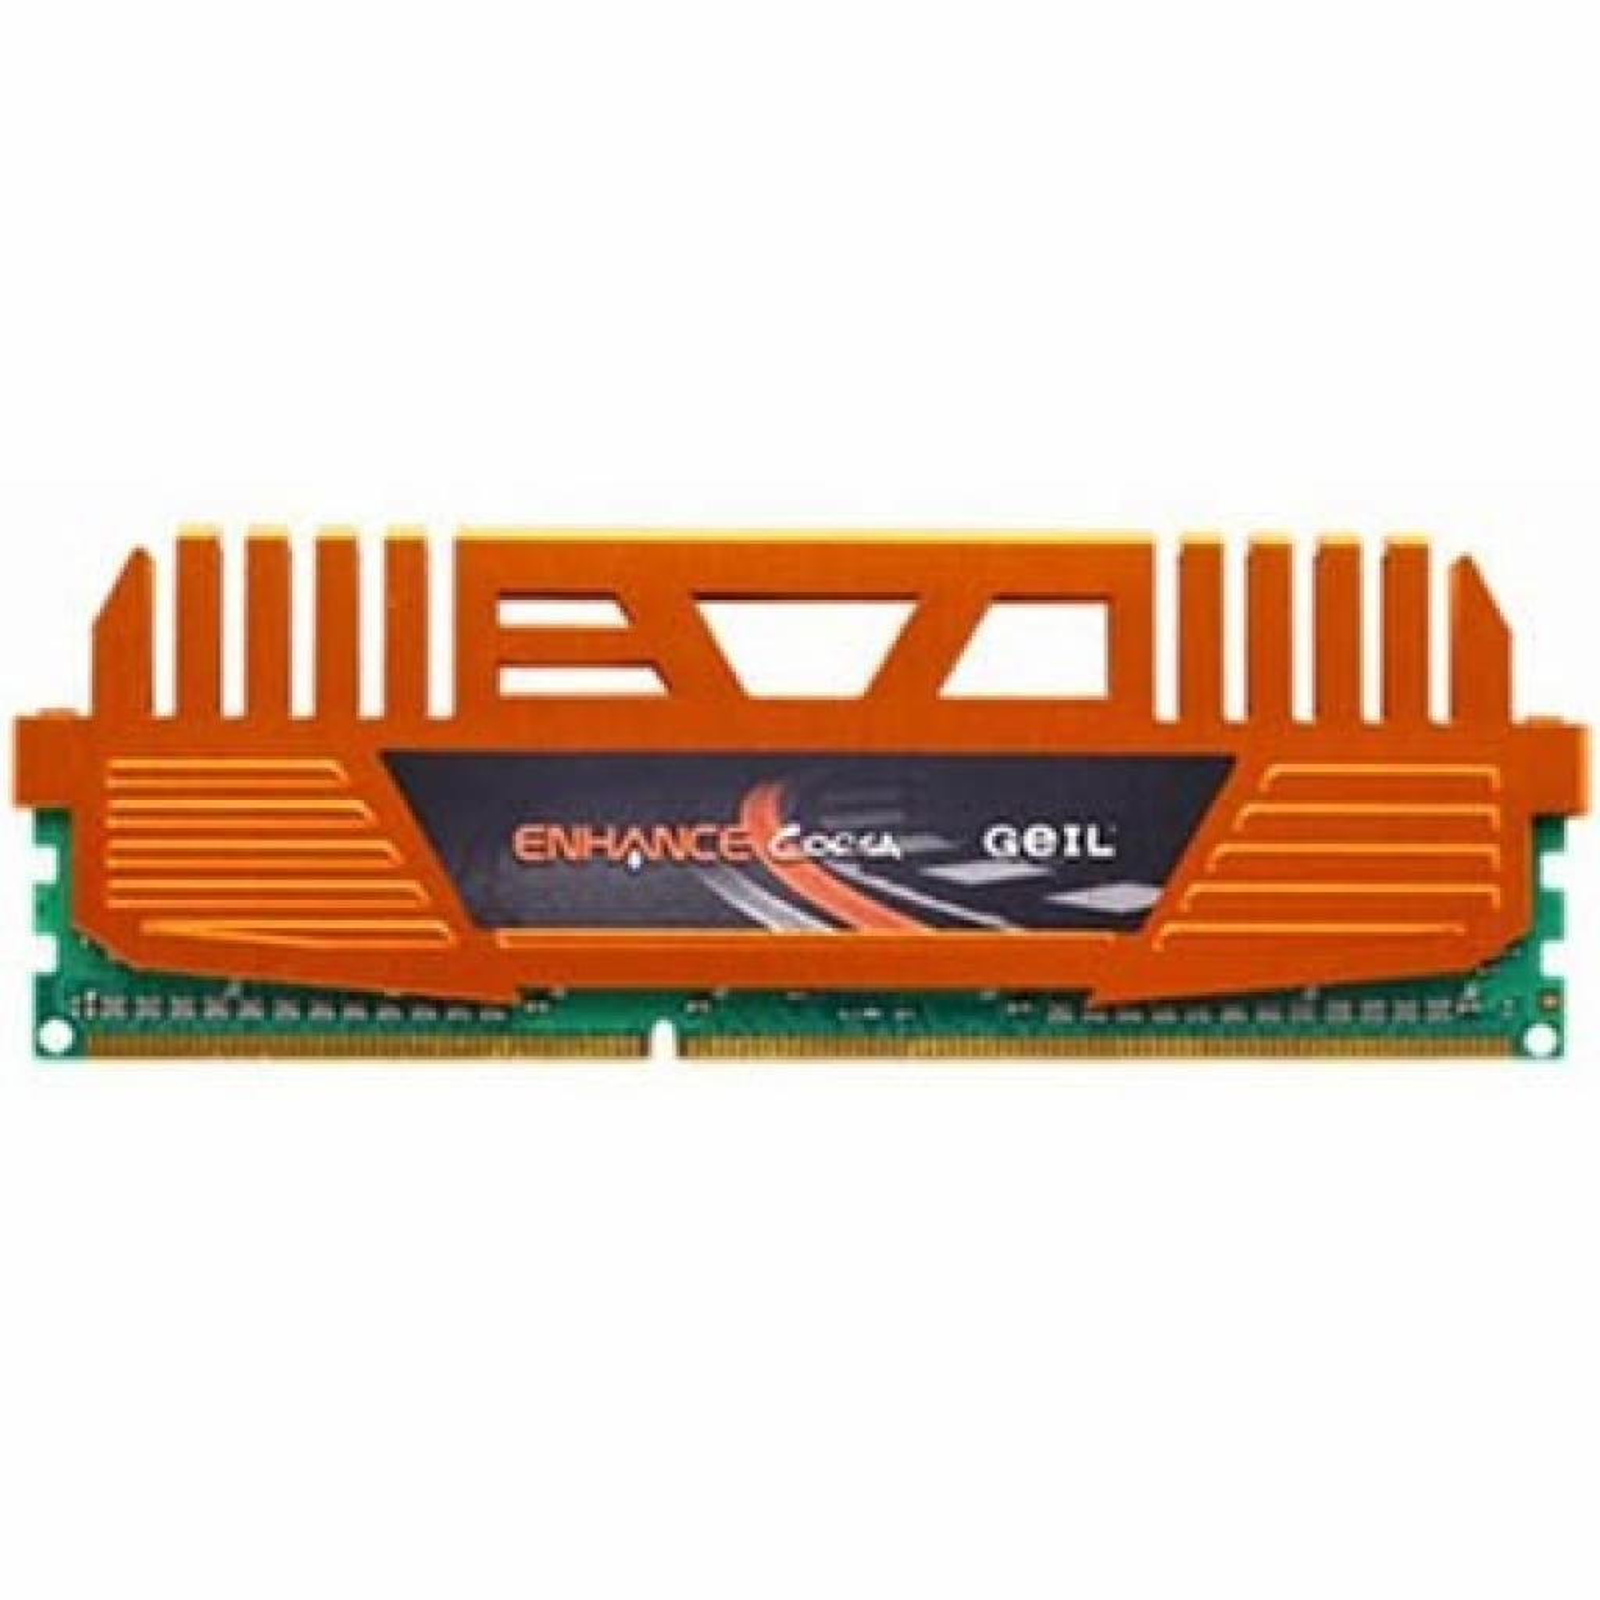 Модуль памяти для компьютера DDR3 2GB 1333 MHz GEIL (GEC32GB1333C9SC)